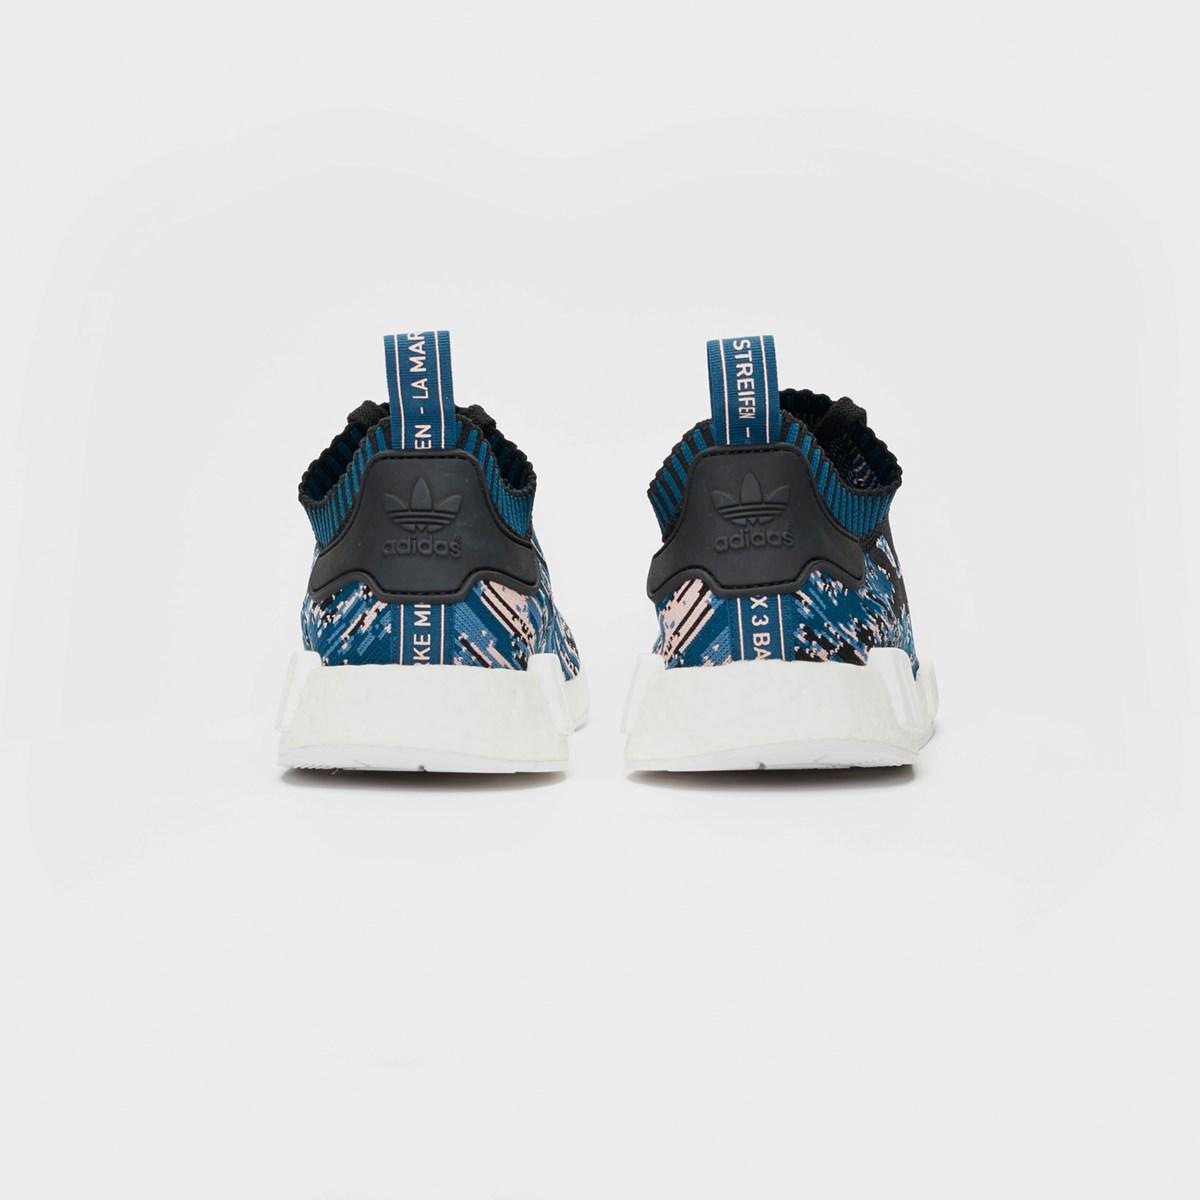 adidas NMD R1 PK Datamosh - Db2842 - Sneakersnstuff   sneakers & streetwear online since 1999